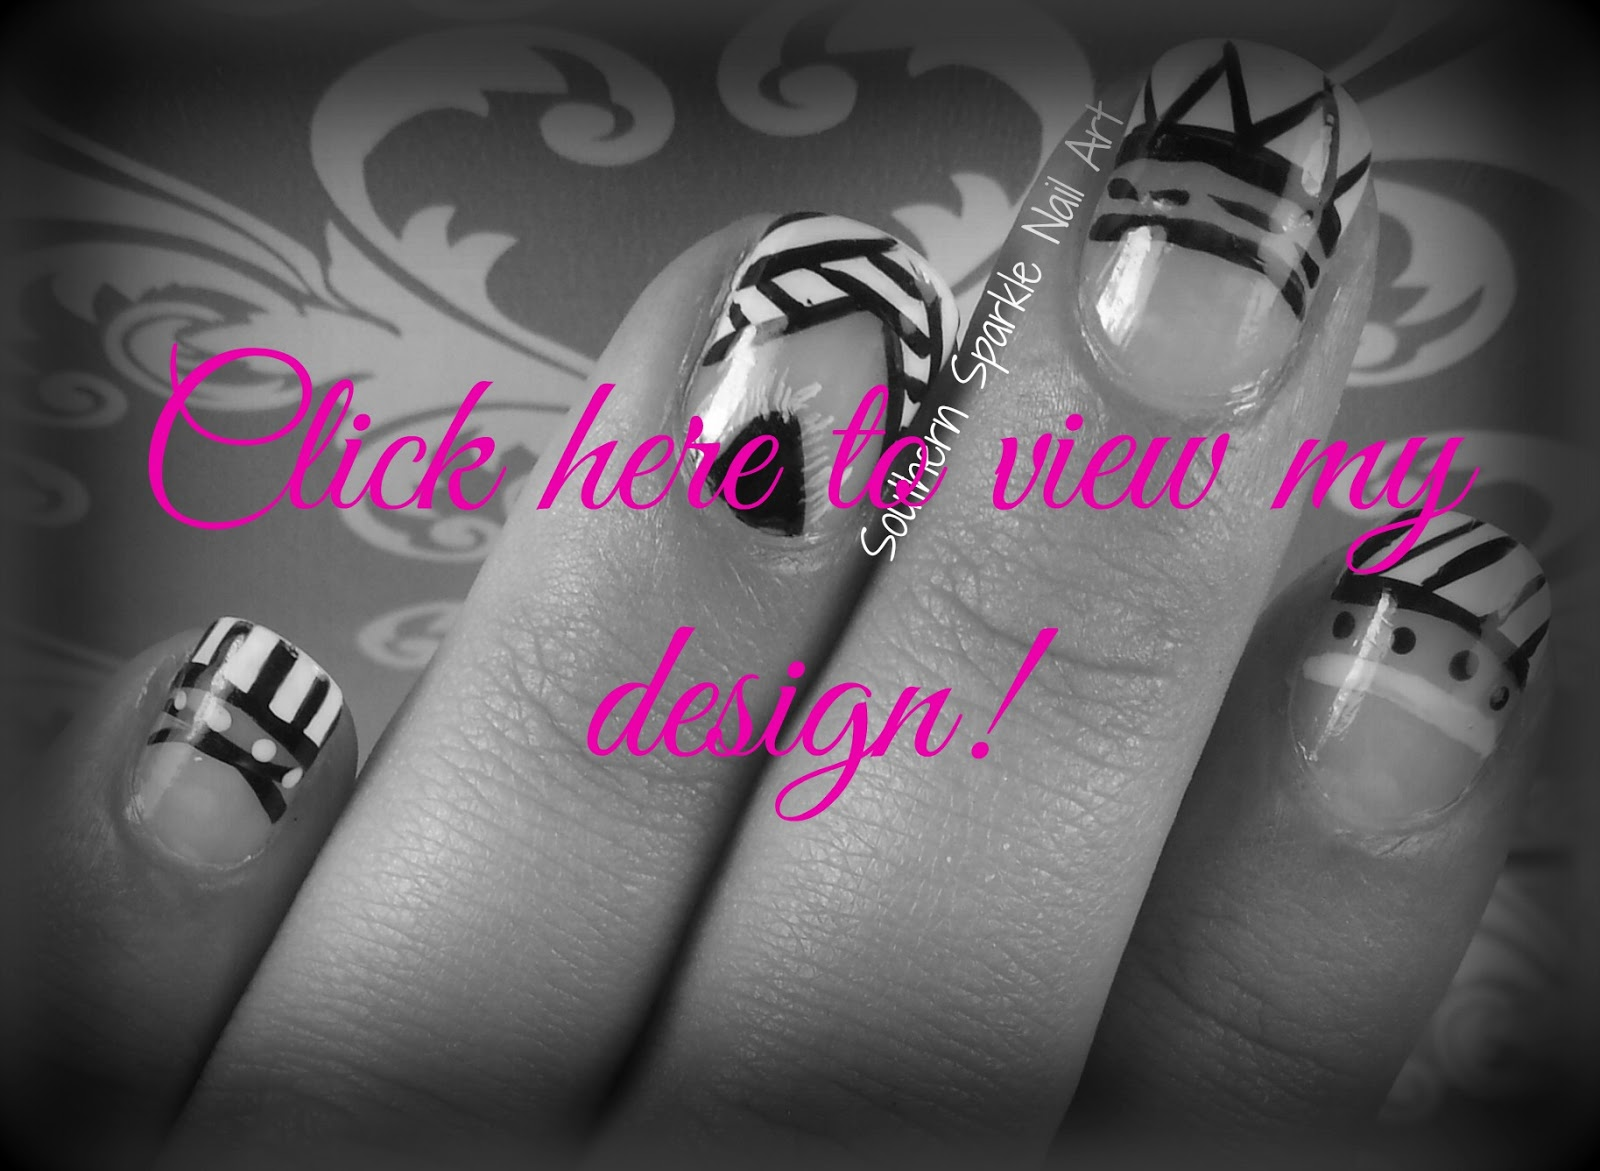 http://manisandmakeovers.blogspot.com/